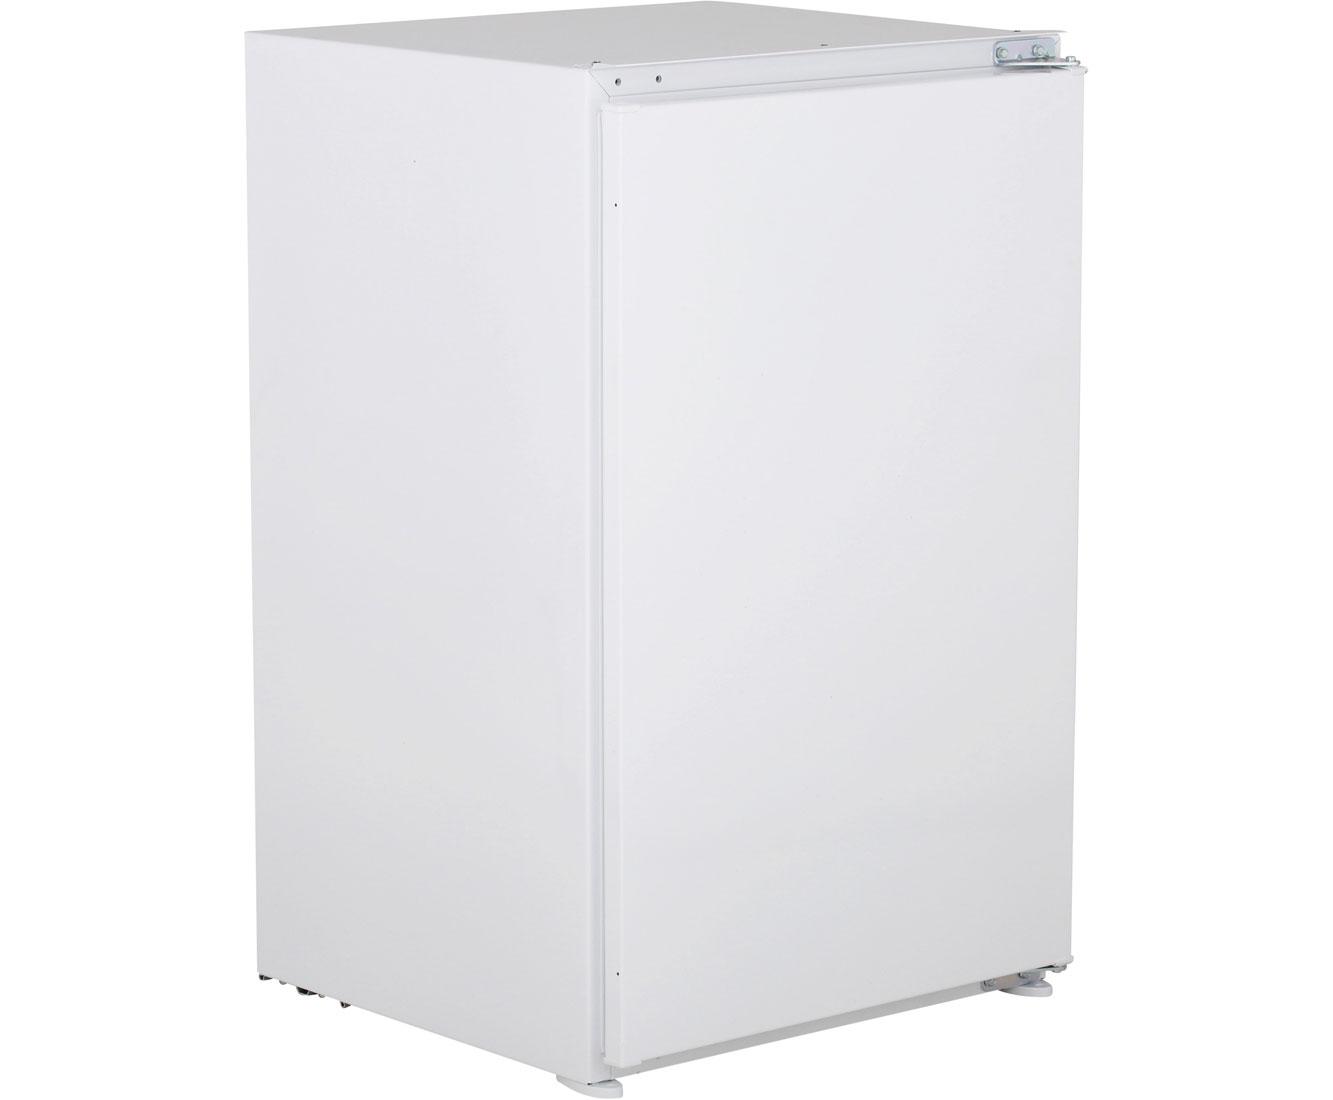 Minibar Kühlschrank Einbau : Kühlschrank neu finebuy mini kühlschrank minibar weiß l c